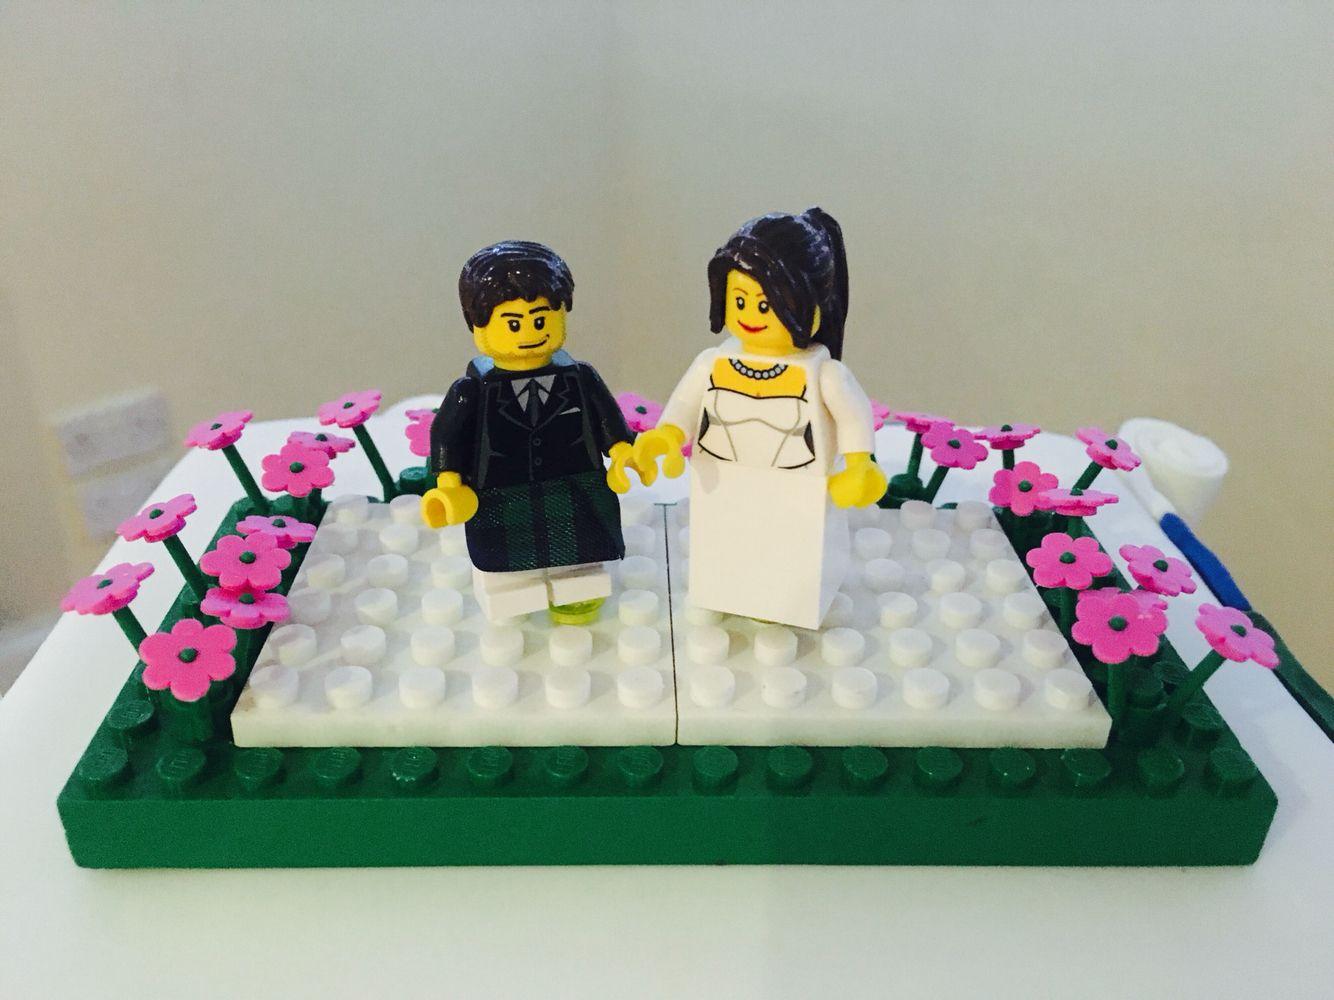 Lego Themed Wedding Cake Topper Grampian Hotel Perth